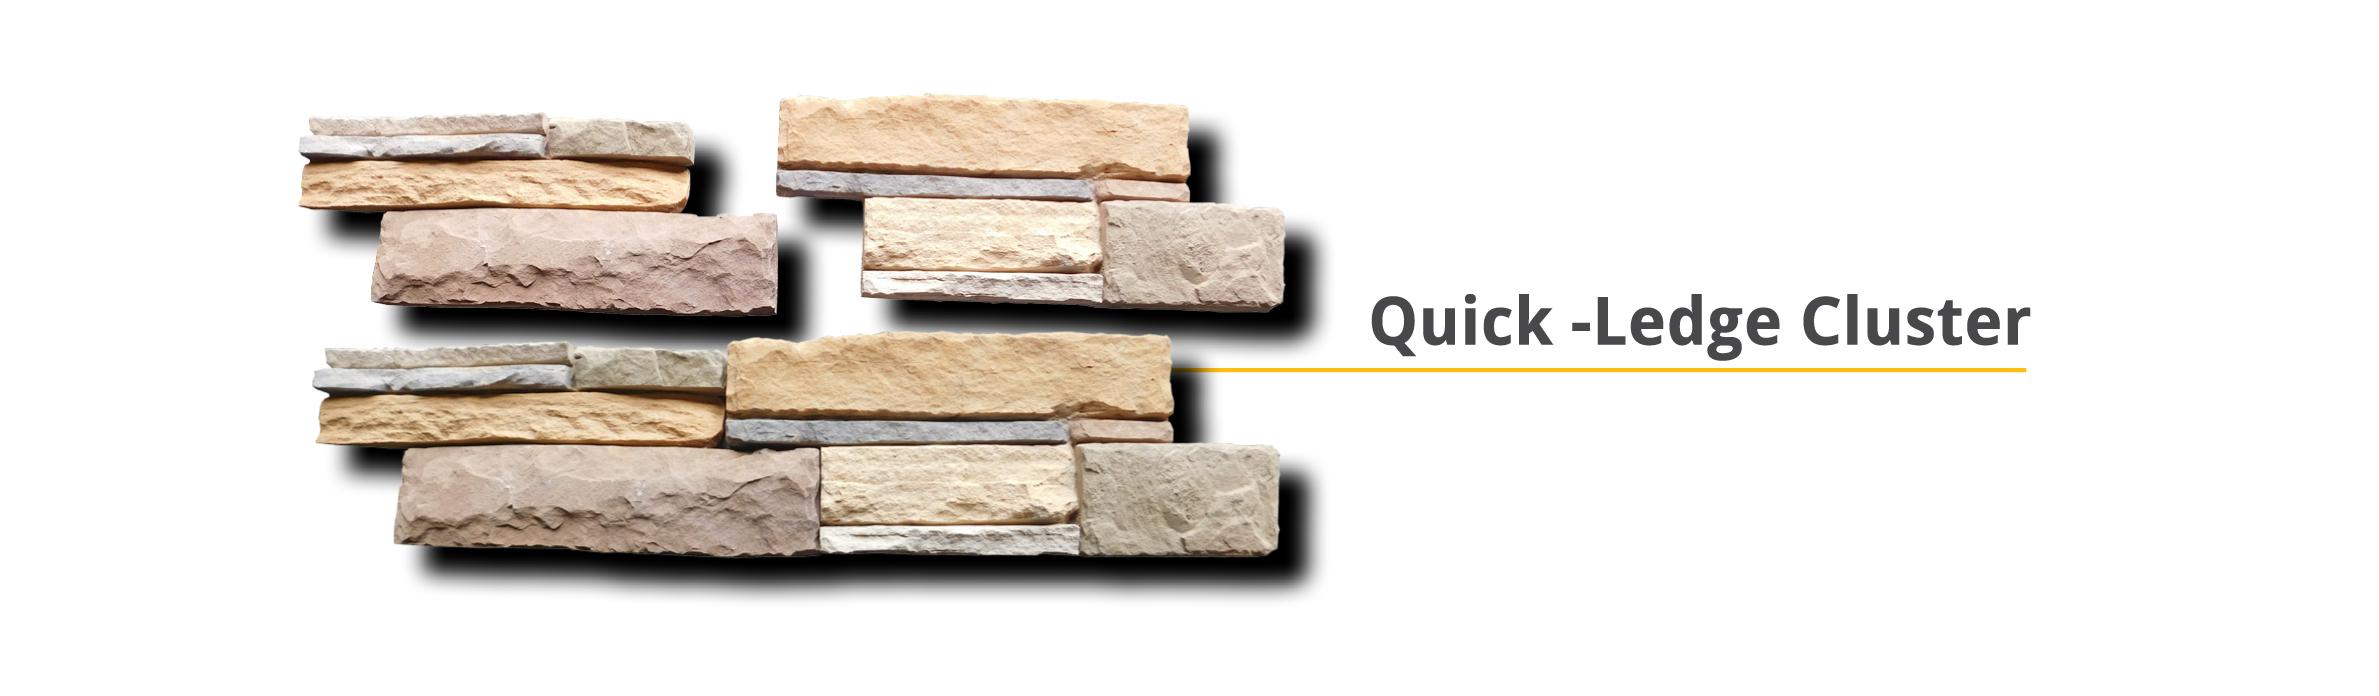 Cluster Quick Ledge Stone